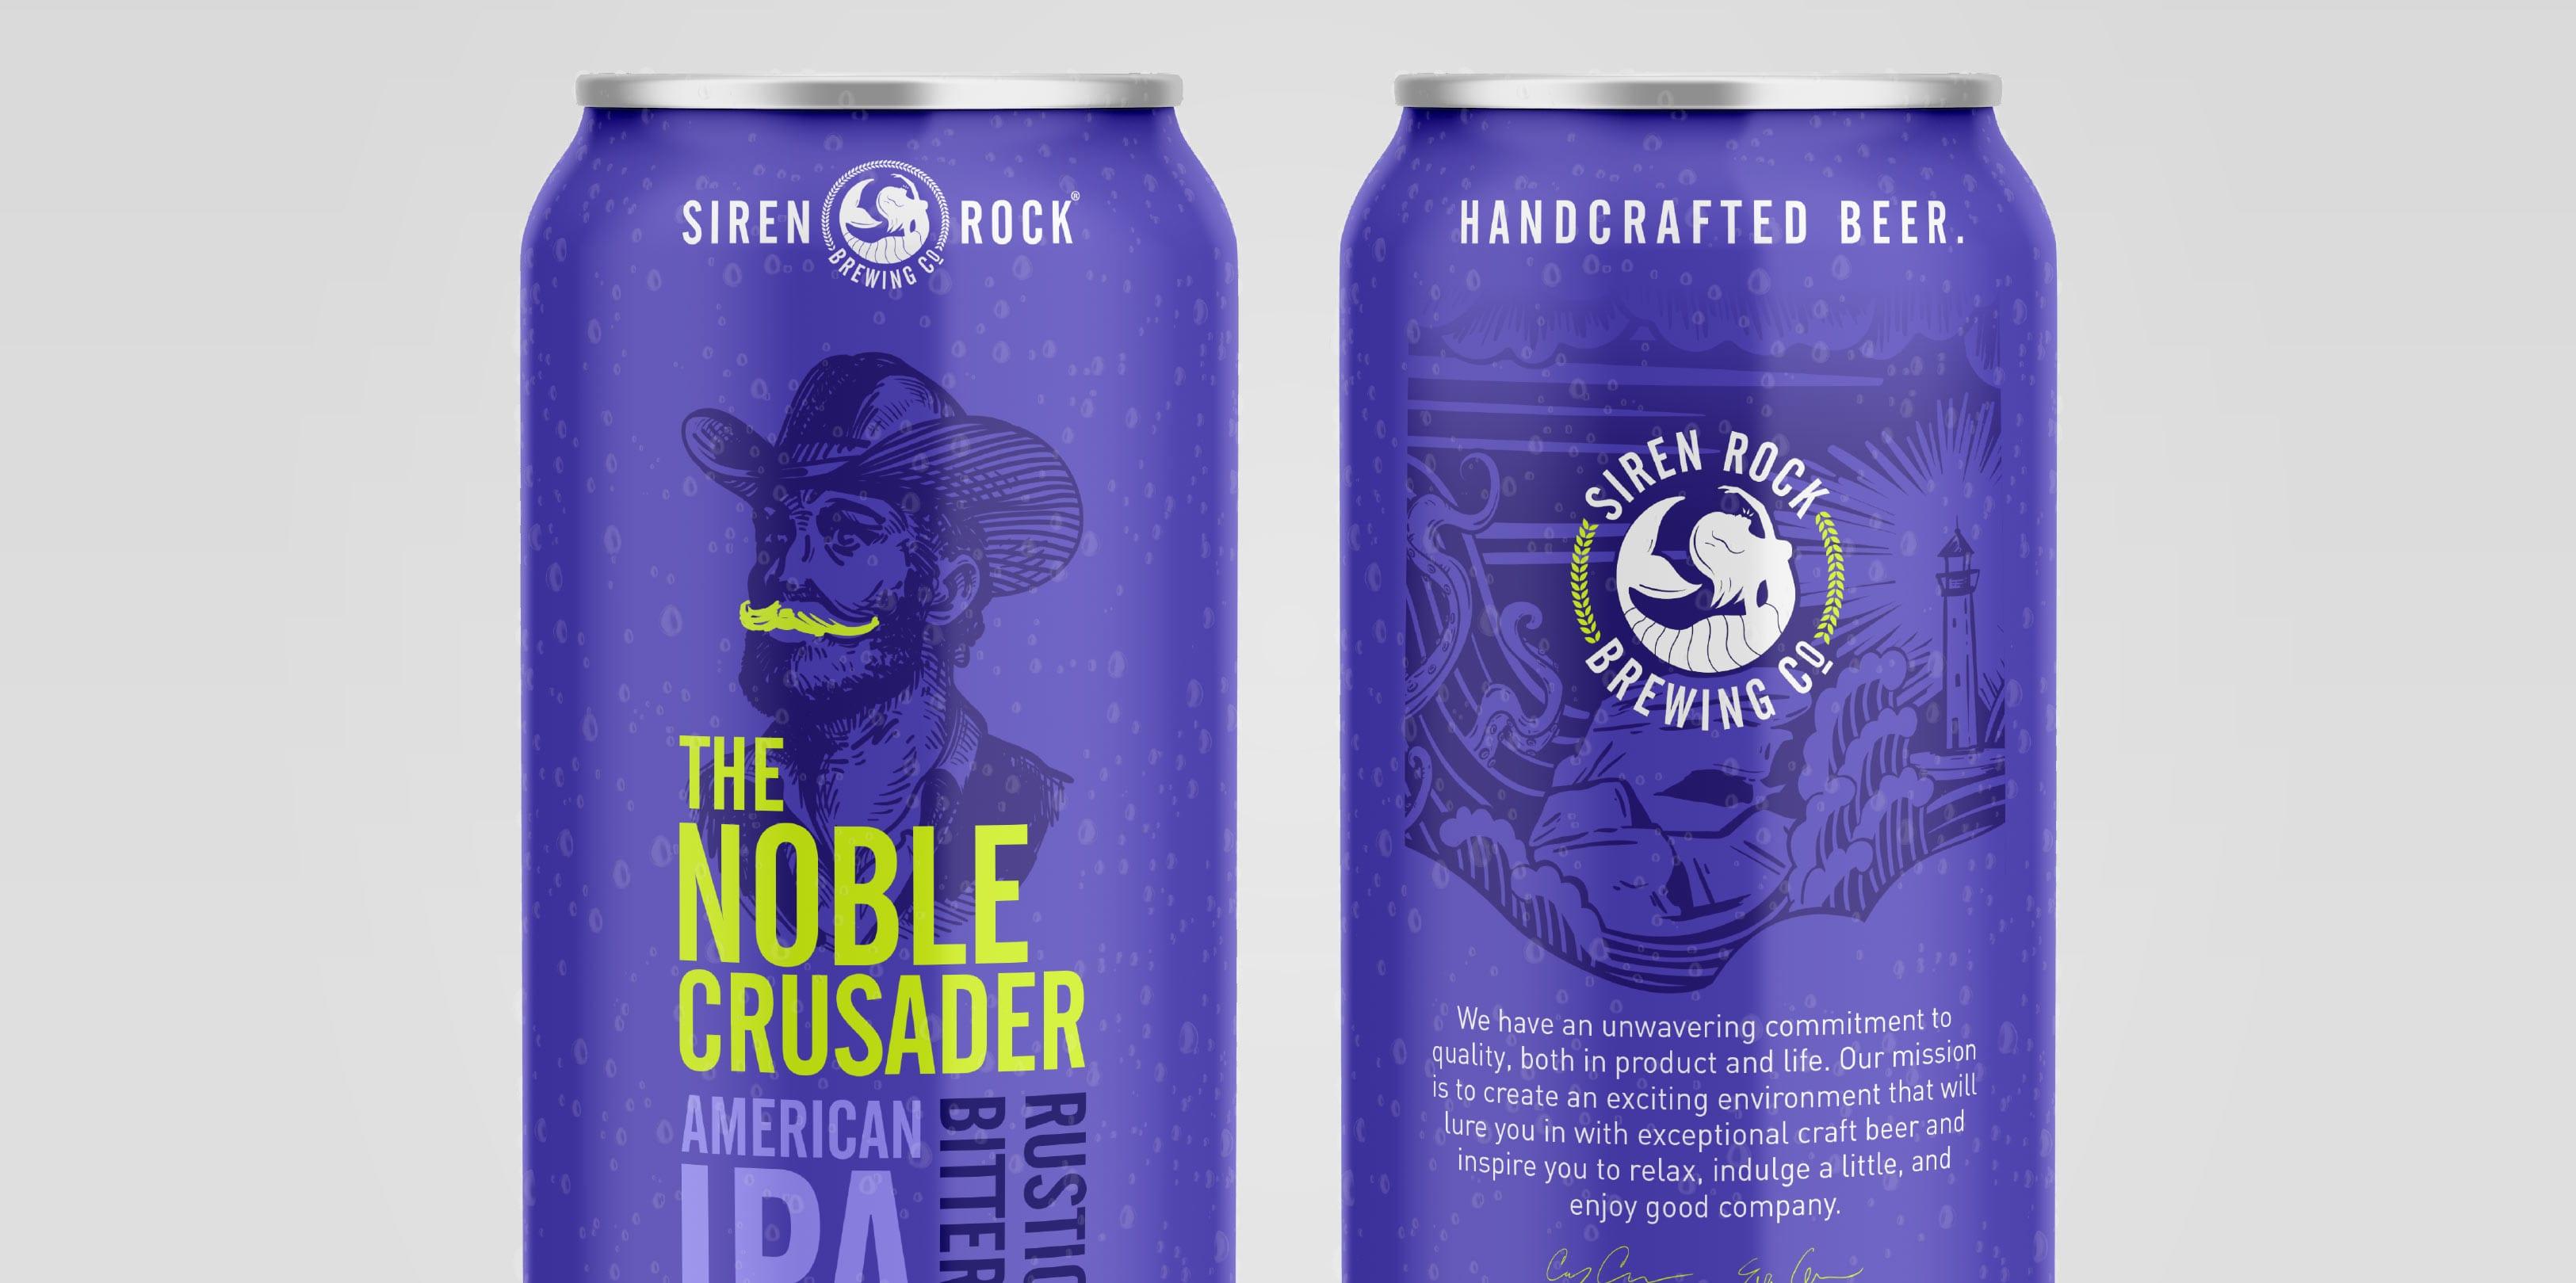 Siren Rock Package Design The Noble Crusader